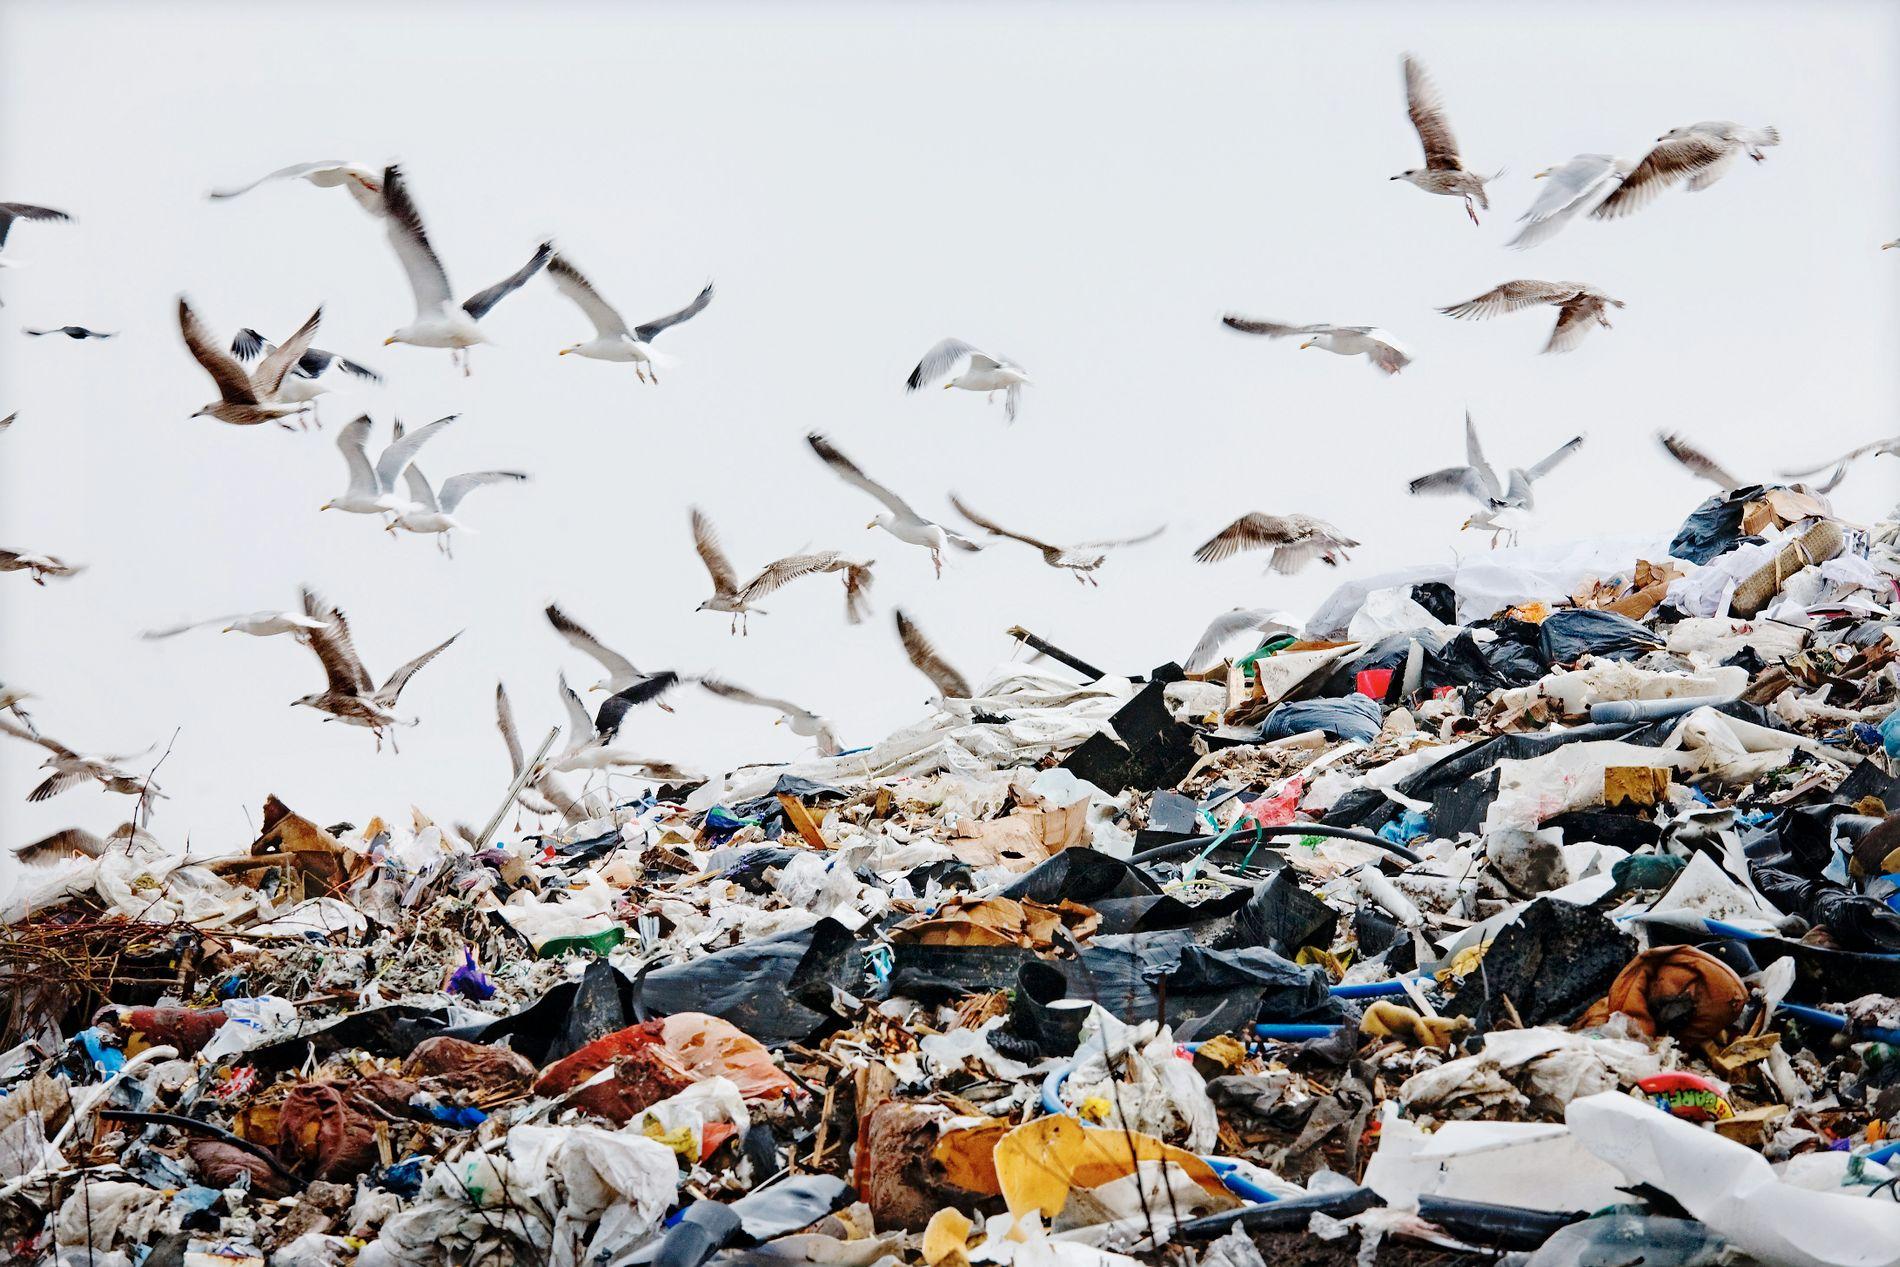 FORSØPLING: Plast har en nedbrytingstid på 450 år. Ifølge miljøminister Vidar Helgesen (H) er plast det raskest voksende forurensningsproblemet i vår tid.